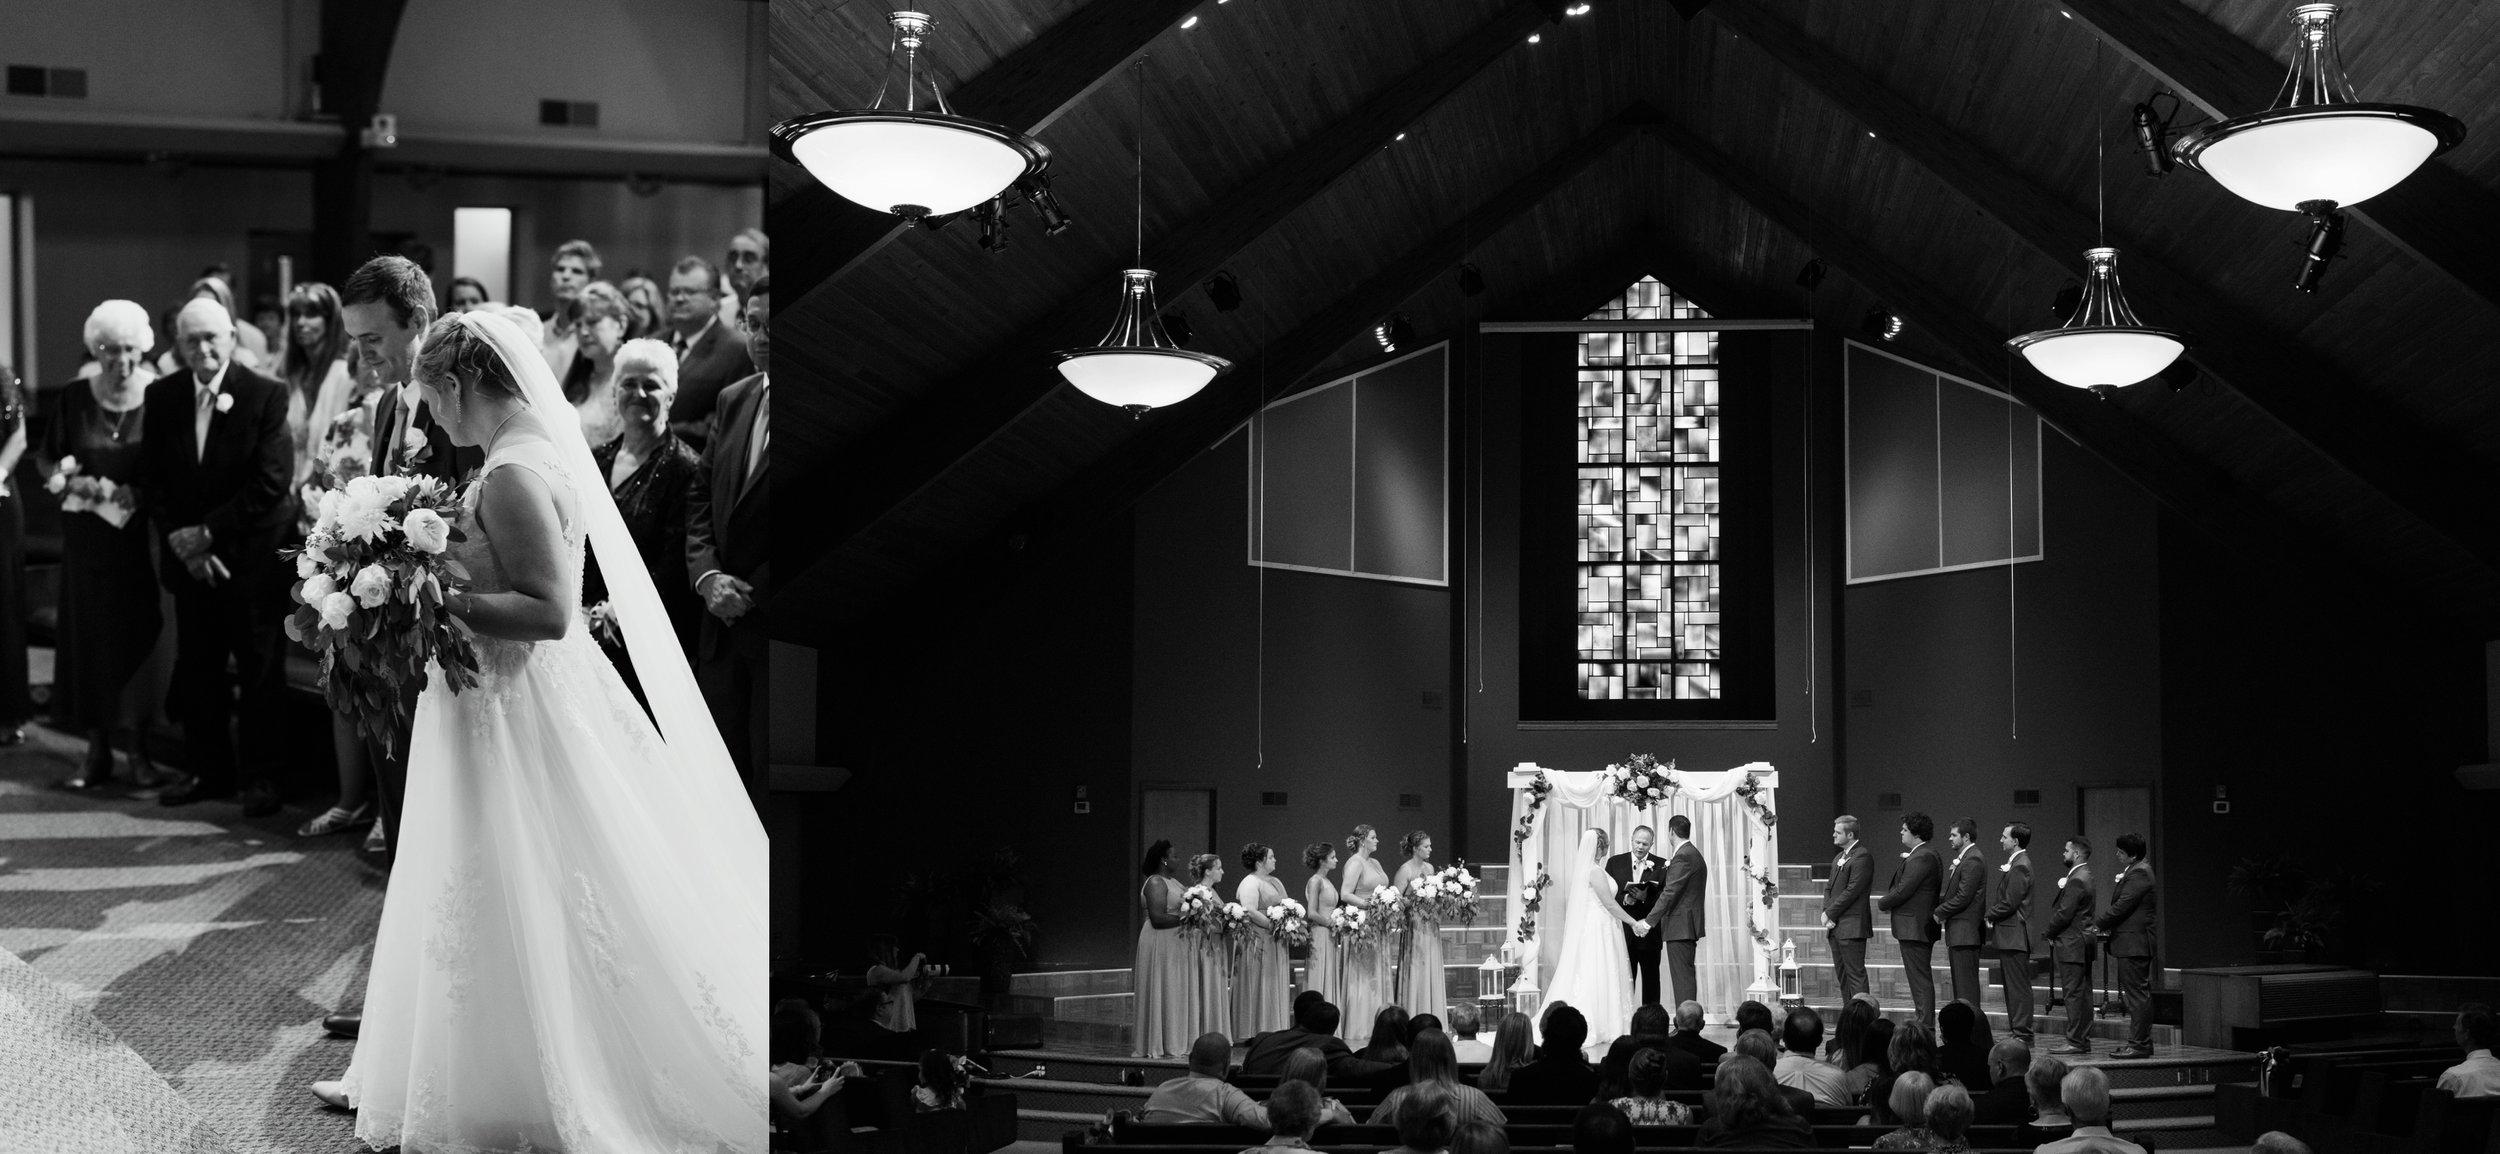 Church-Ceremony-Komorebiphotography